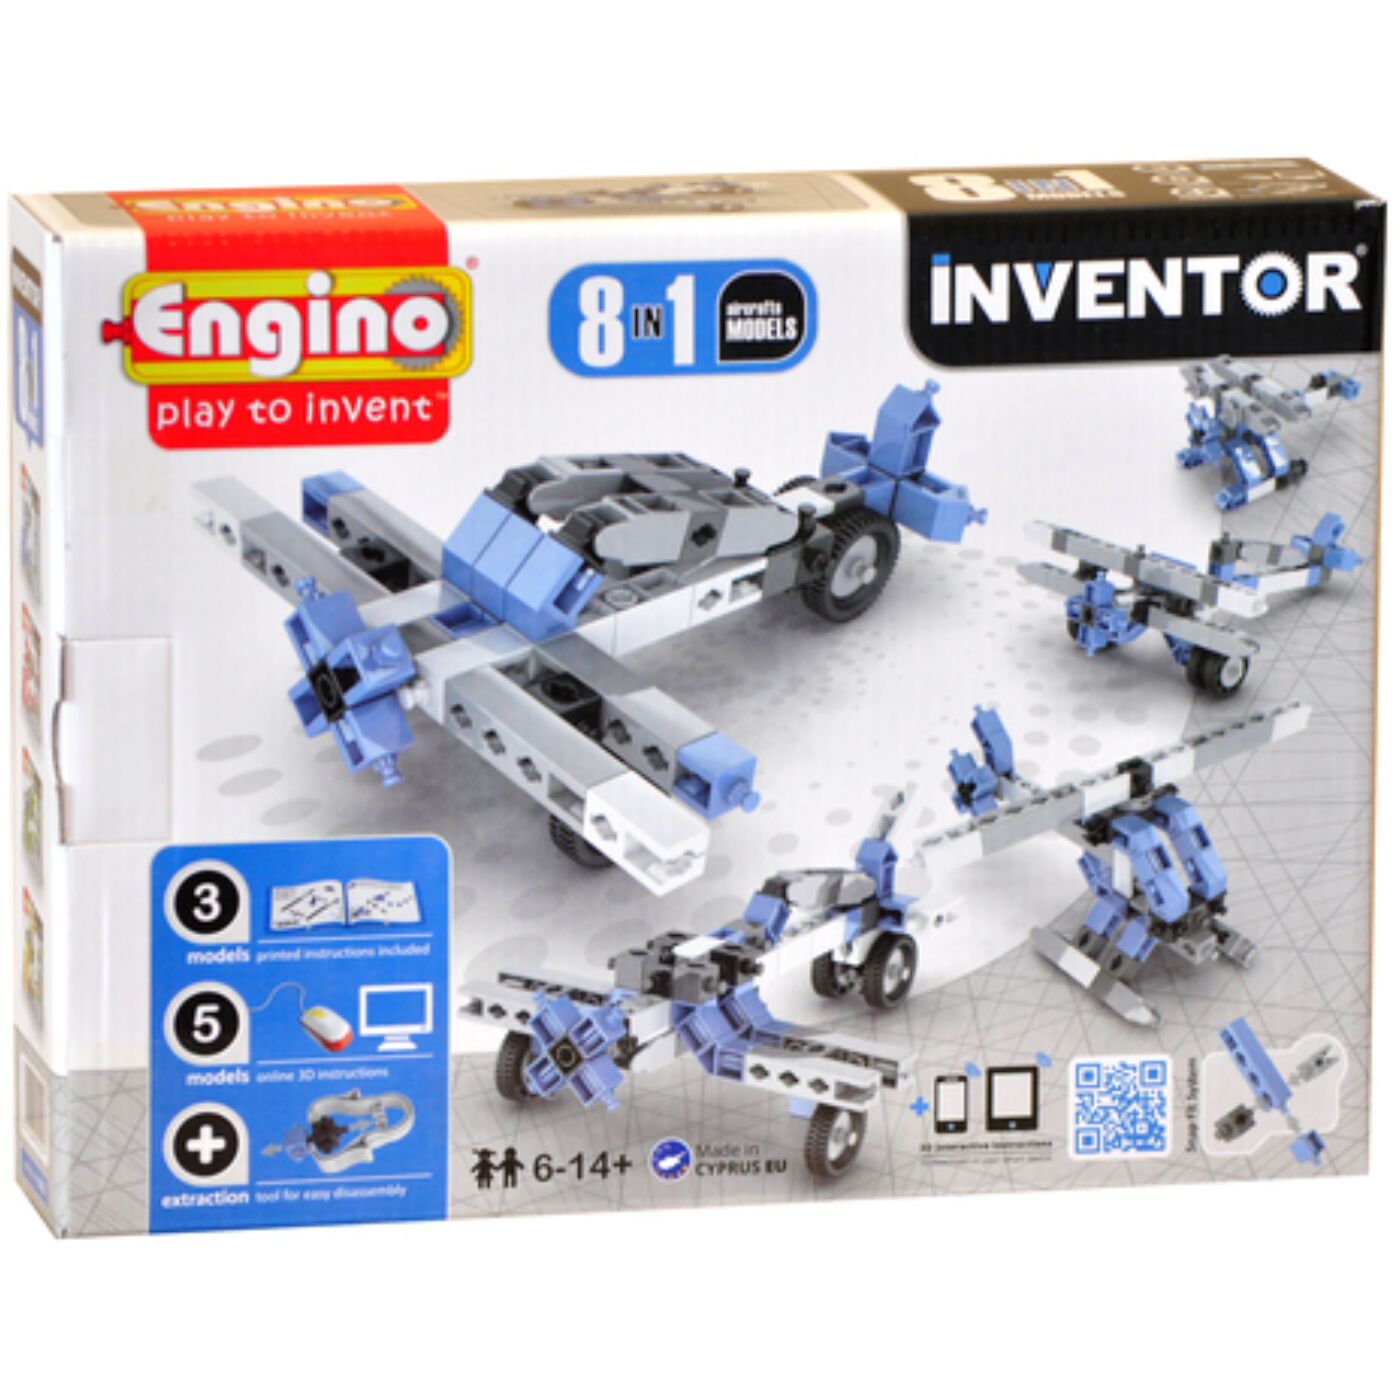 Engino Inventor repülők 8in1